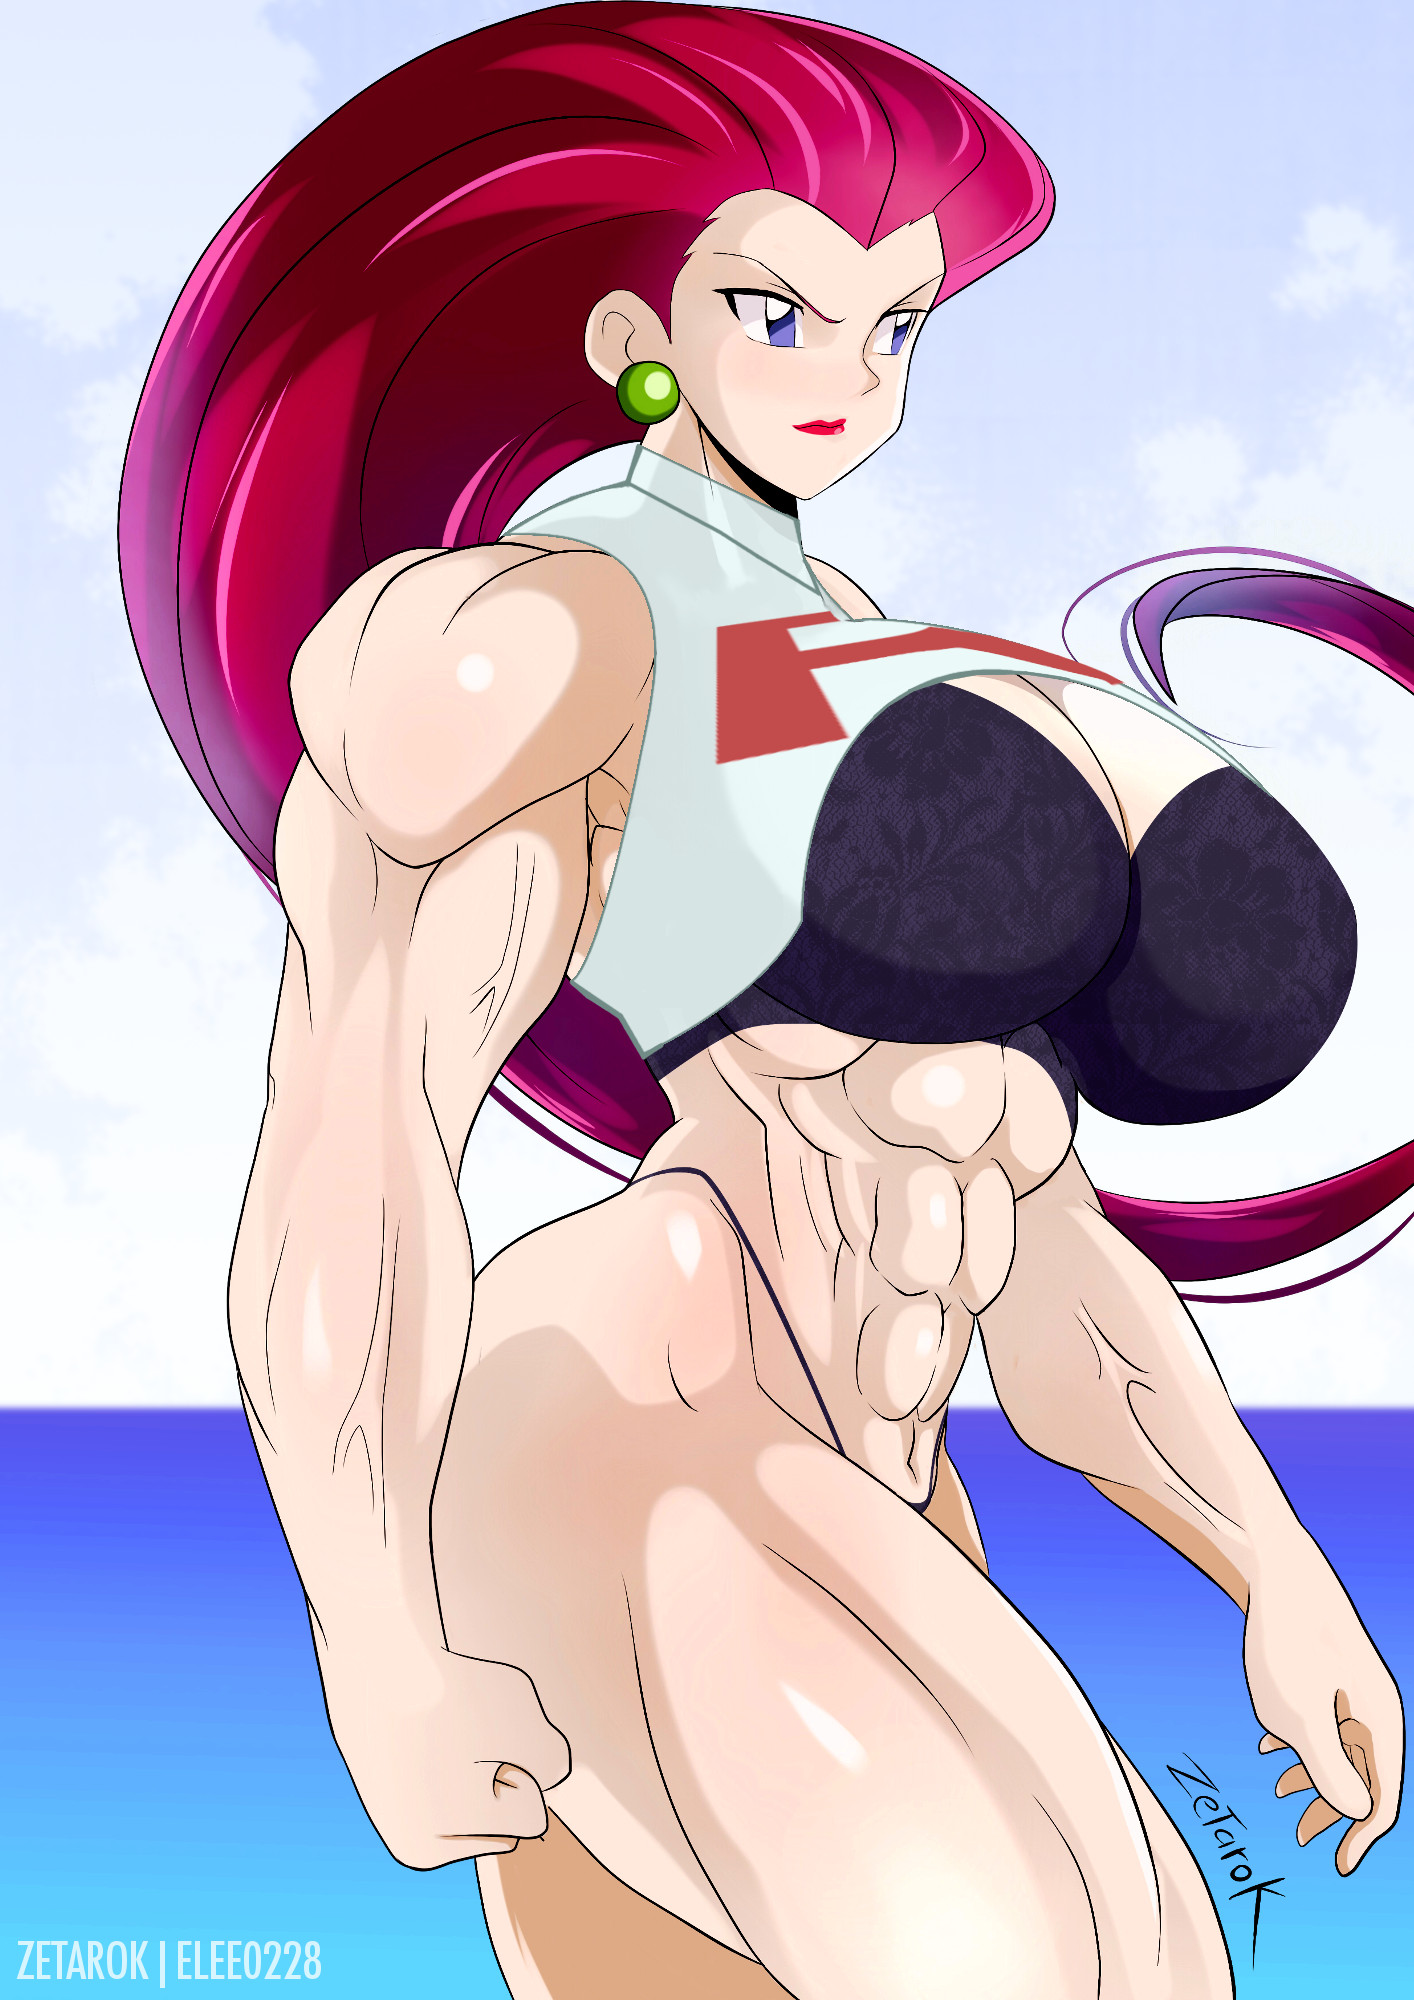 Ese hombre jessie hentai manga cum !!!